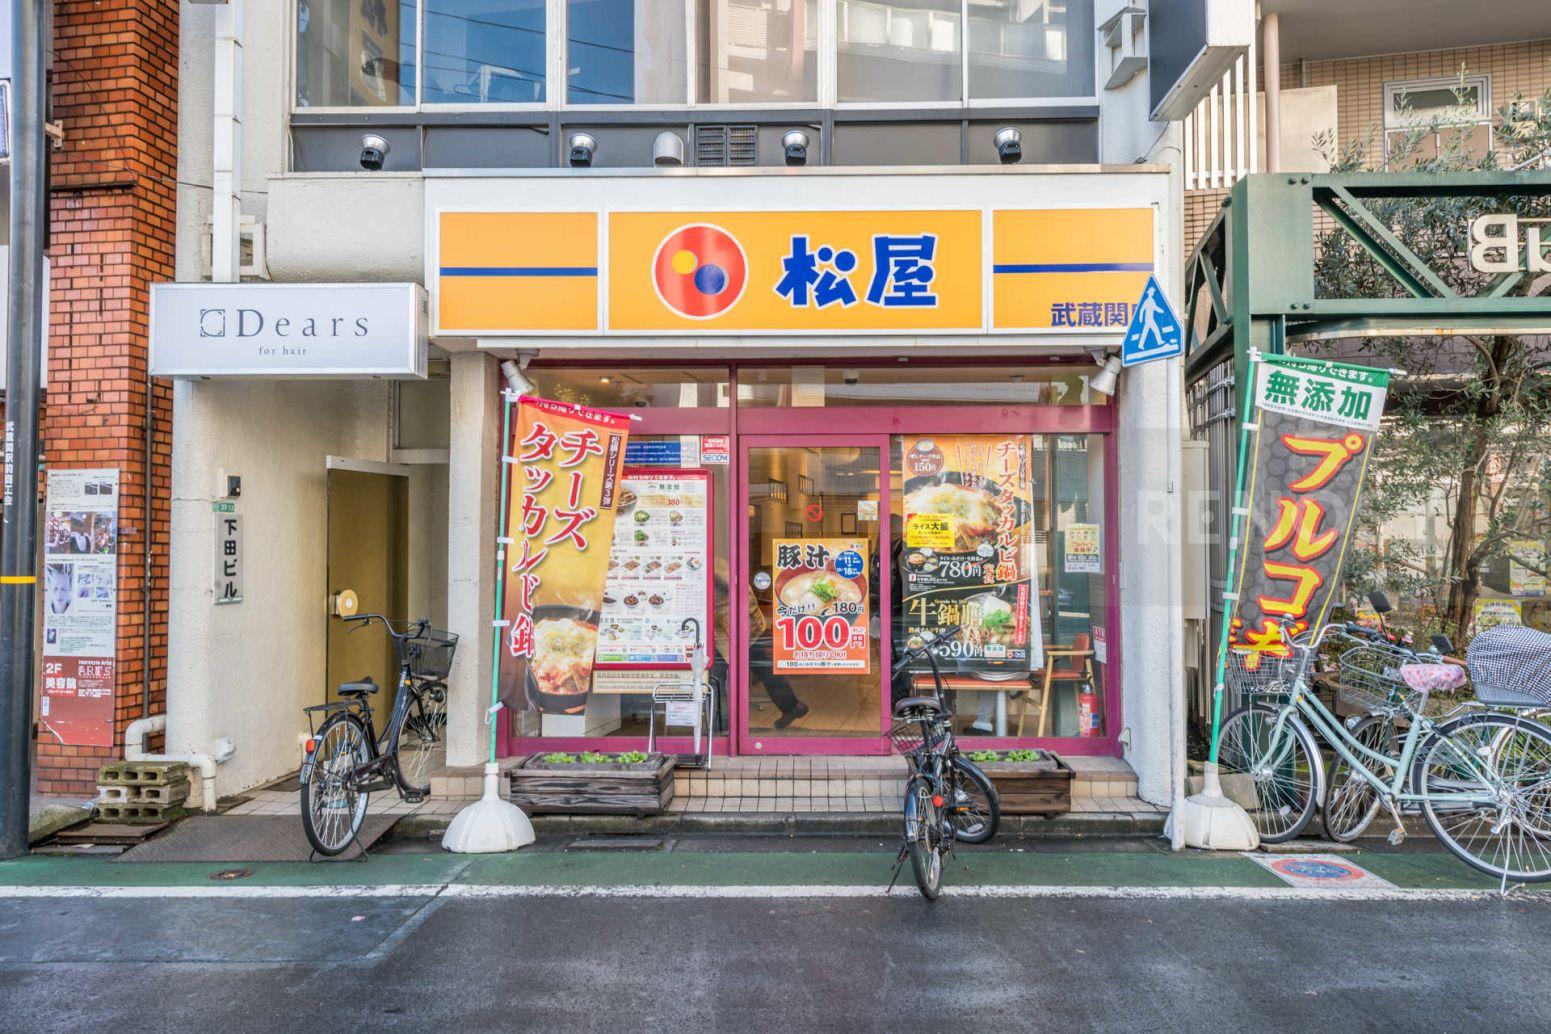 genovia石神井台greenveil